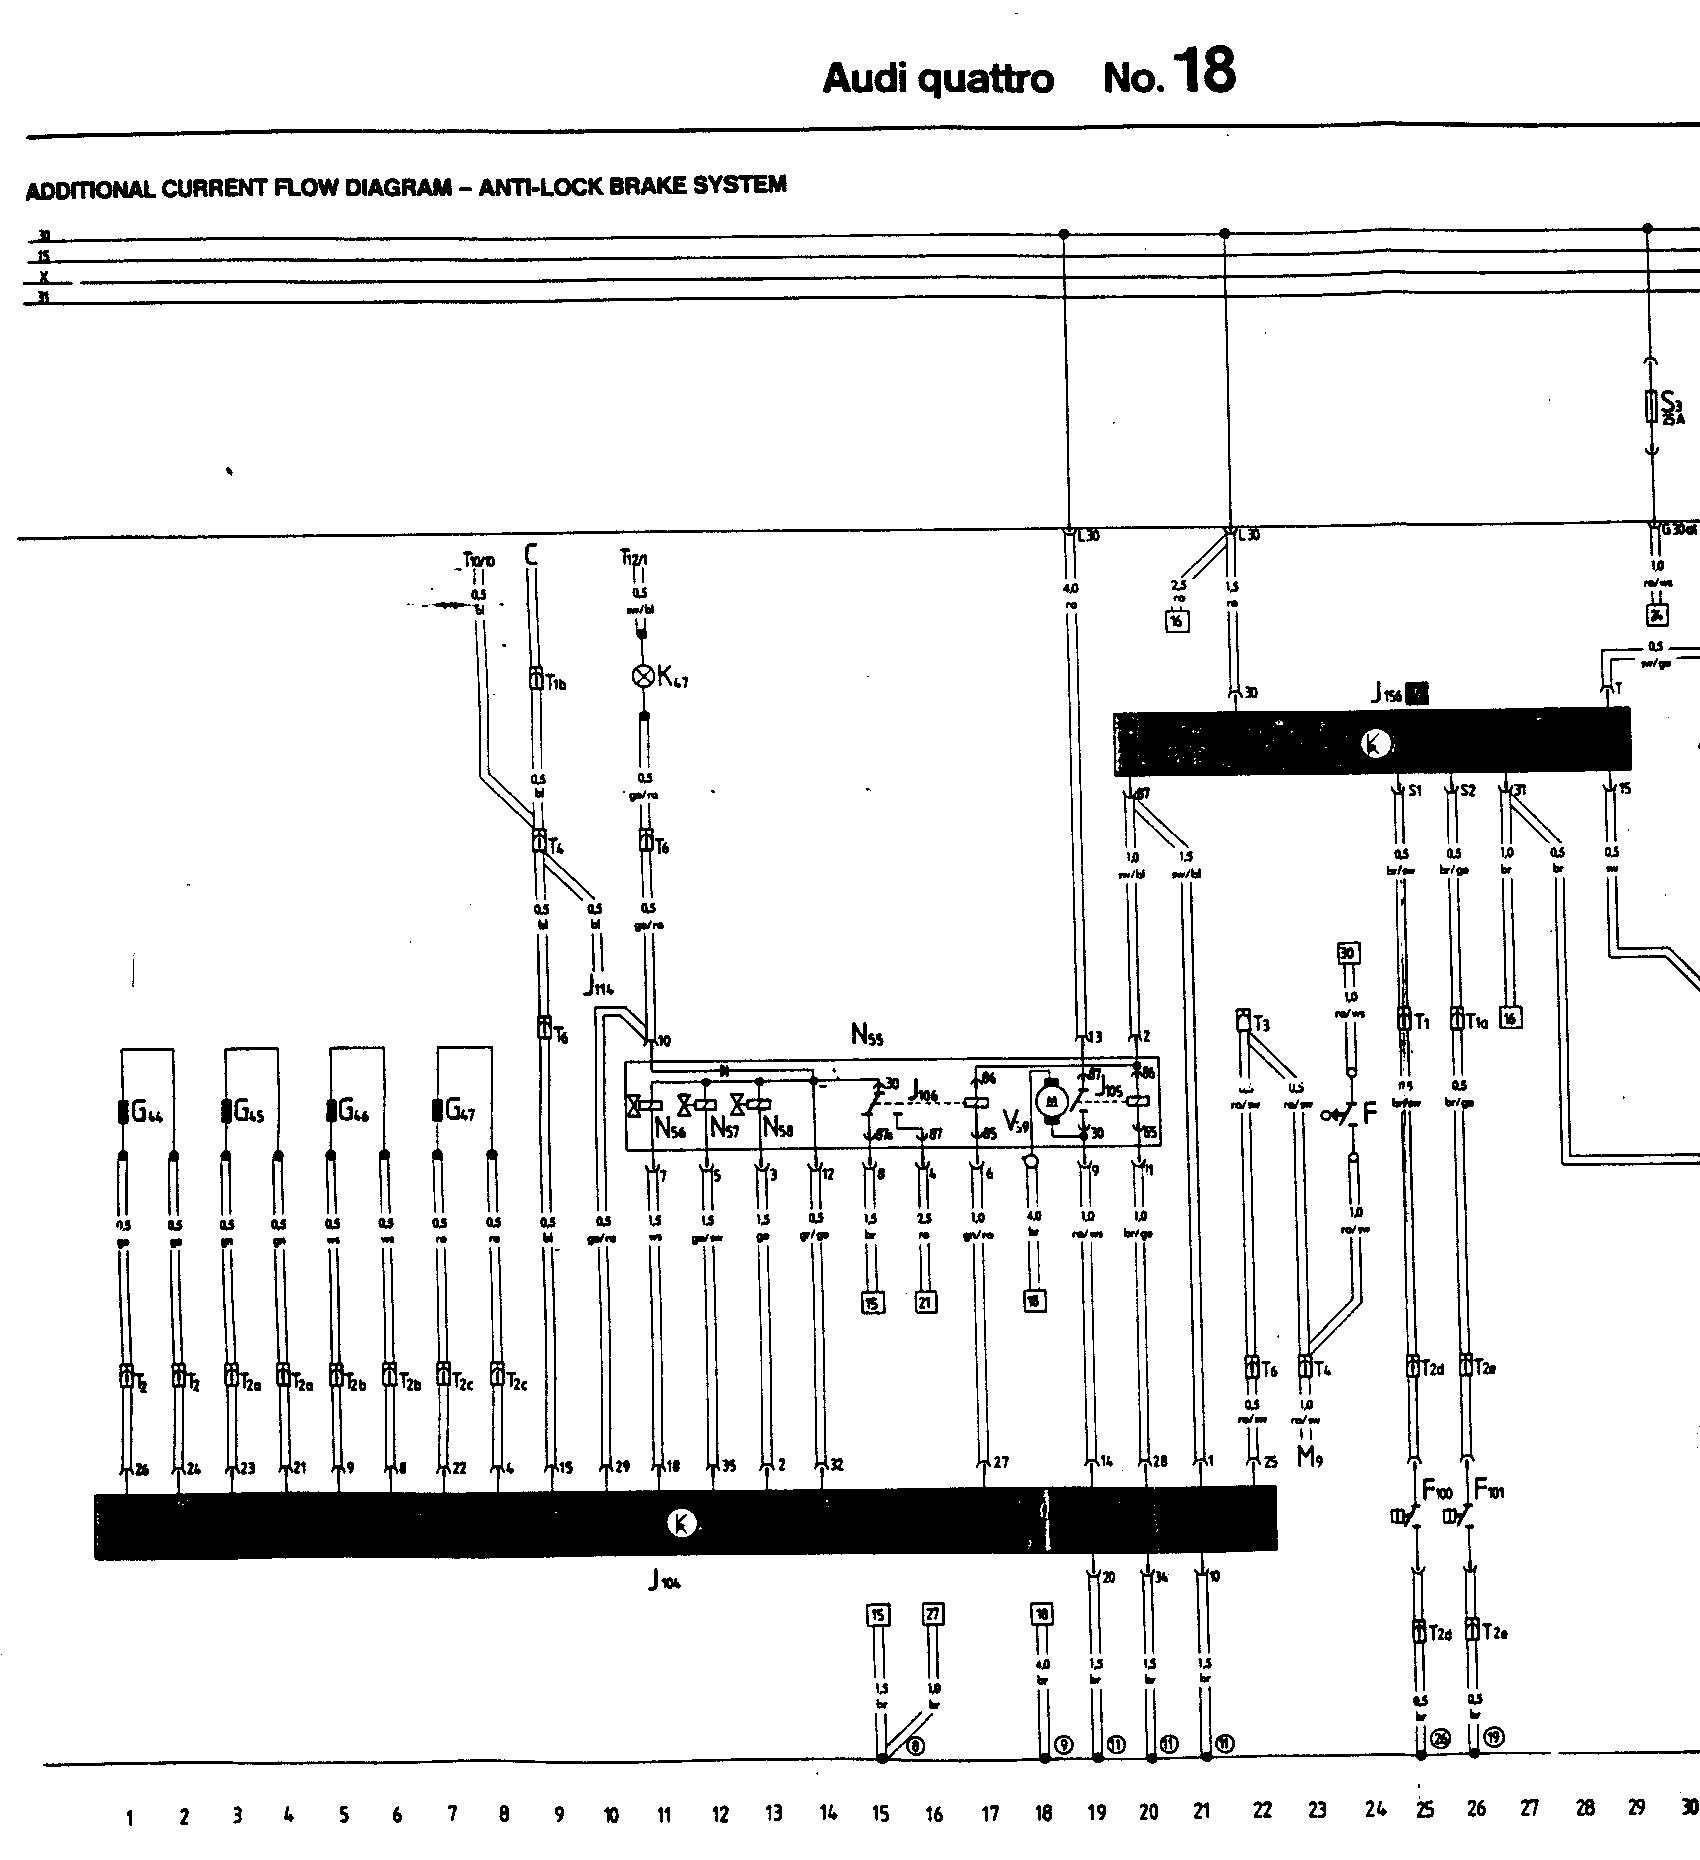 Diagram 18 - ABS wiring Diagram Tracks 4-32